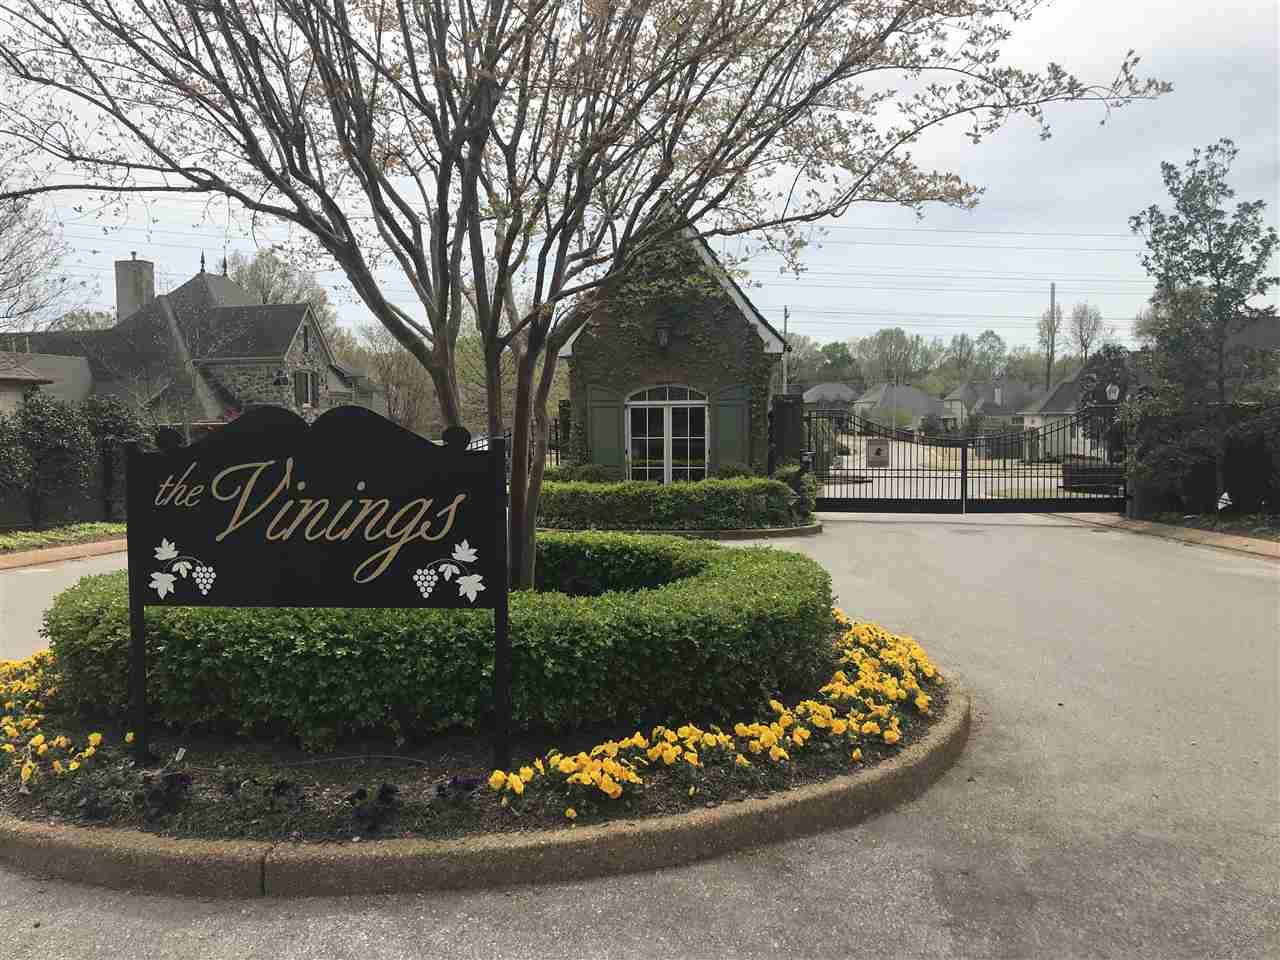 6673 W Vinings Creek Memphis, TN 38119 - MLS #: 10025955